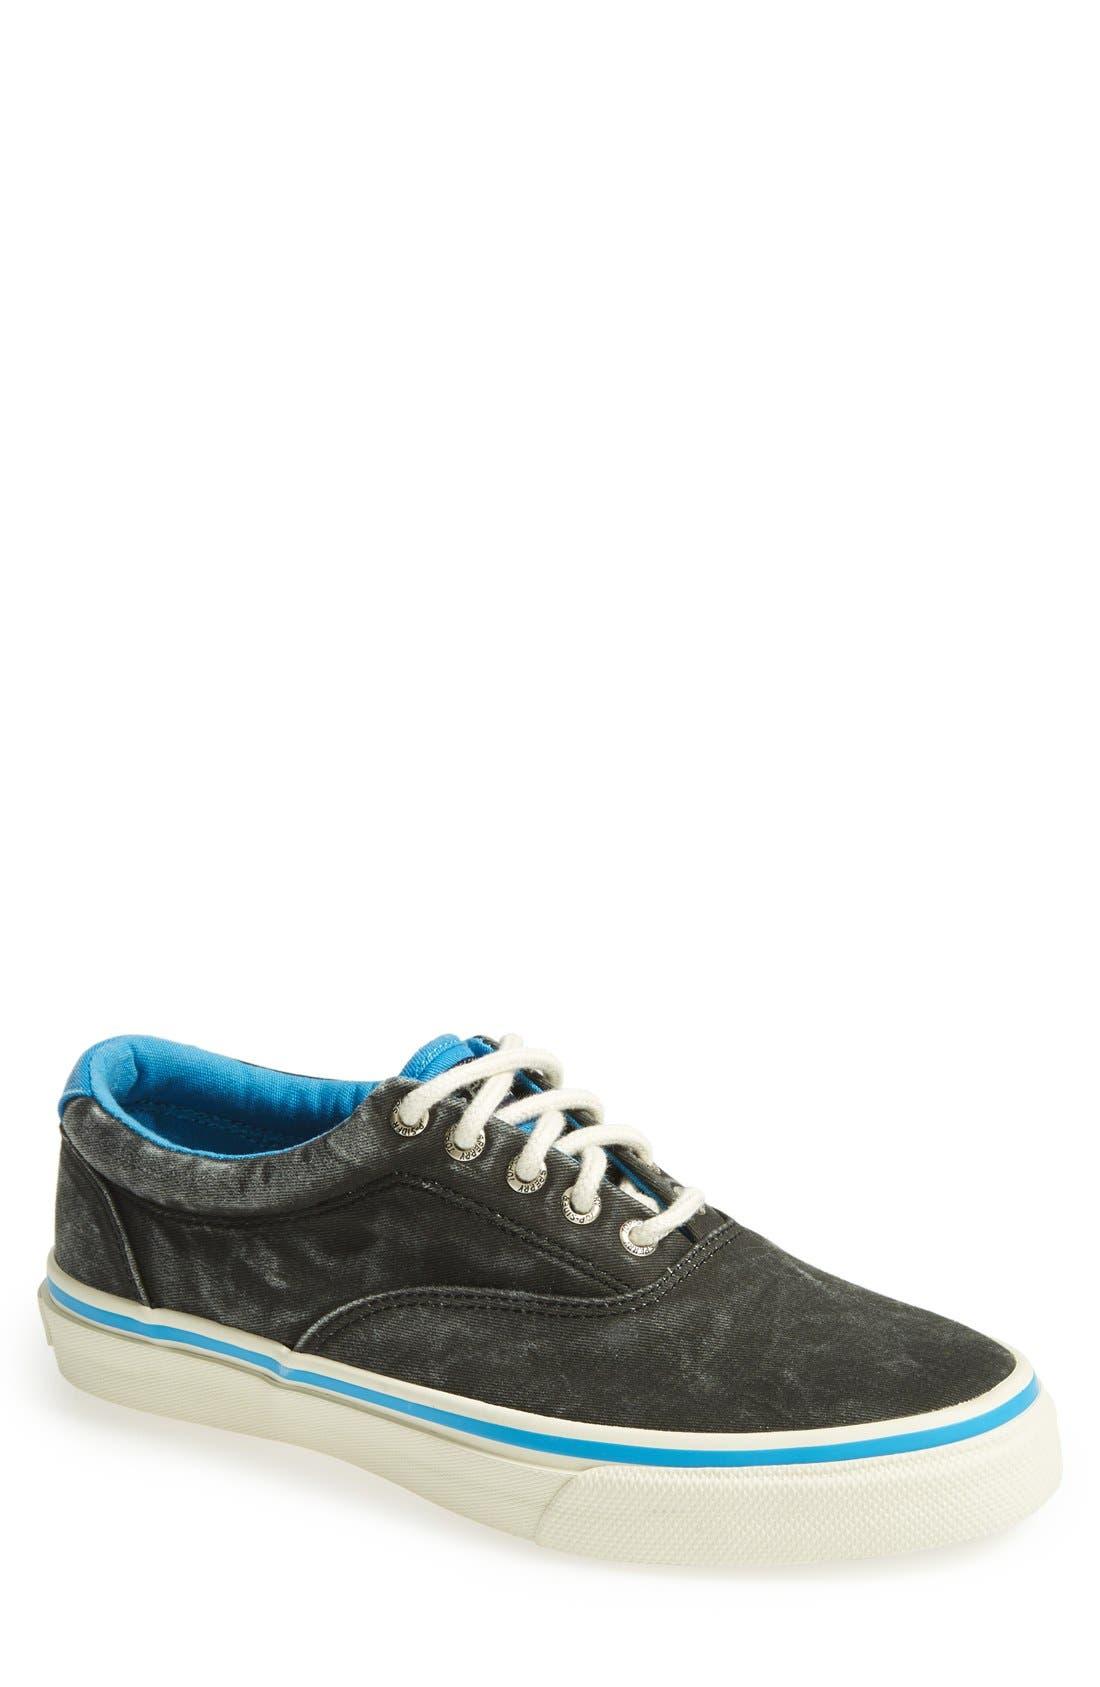 Alternate Image 1 Selected - Sperry Top-Sider® 'Striper CVO' Sneaker (Men)